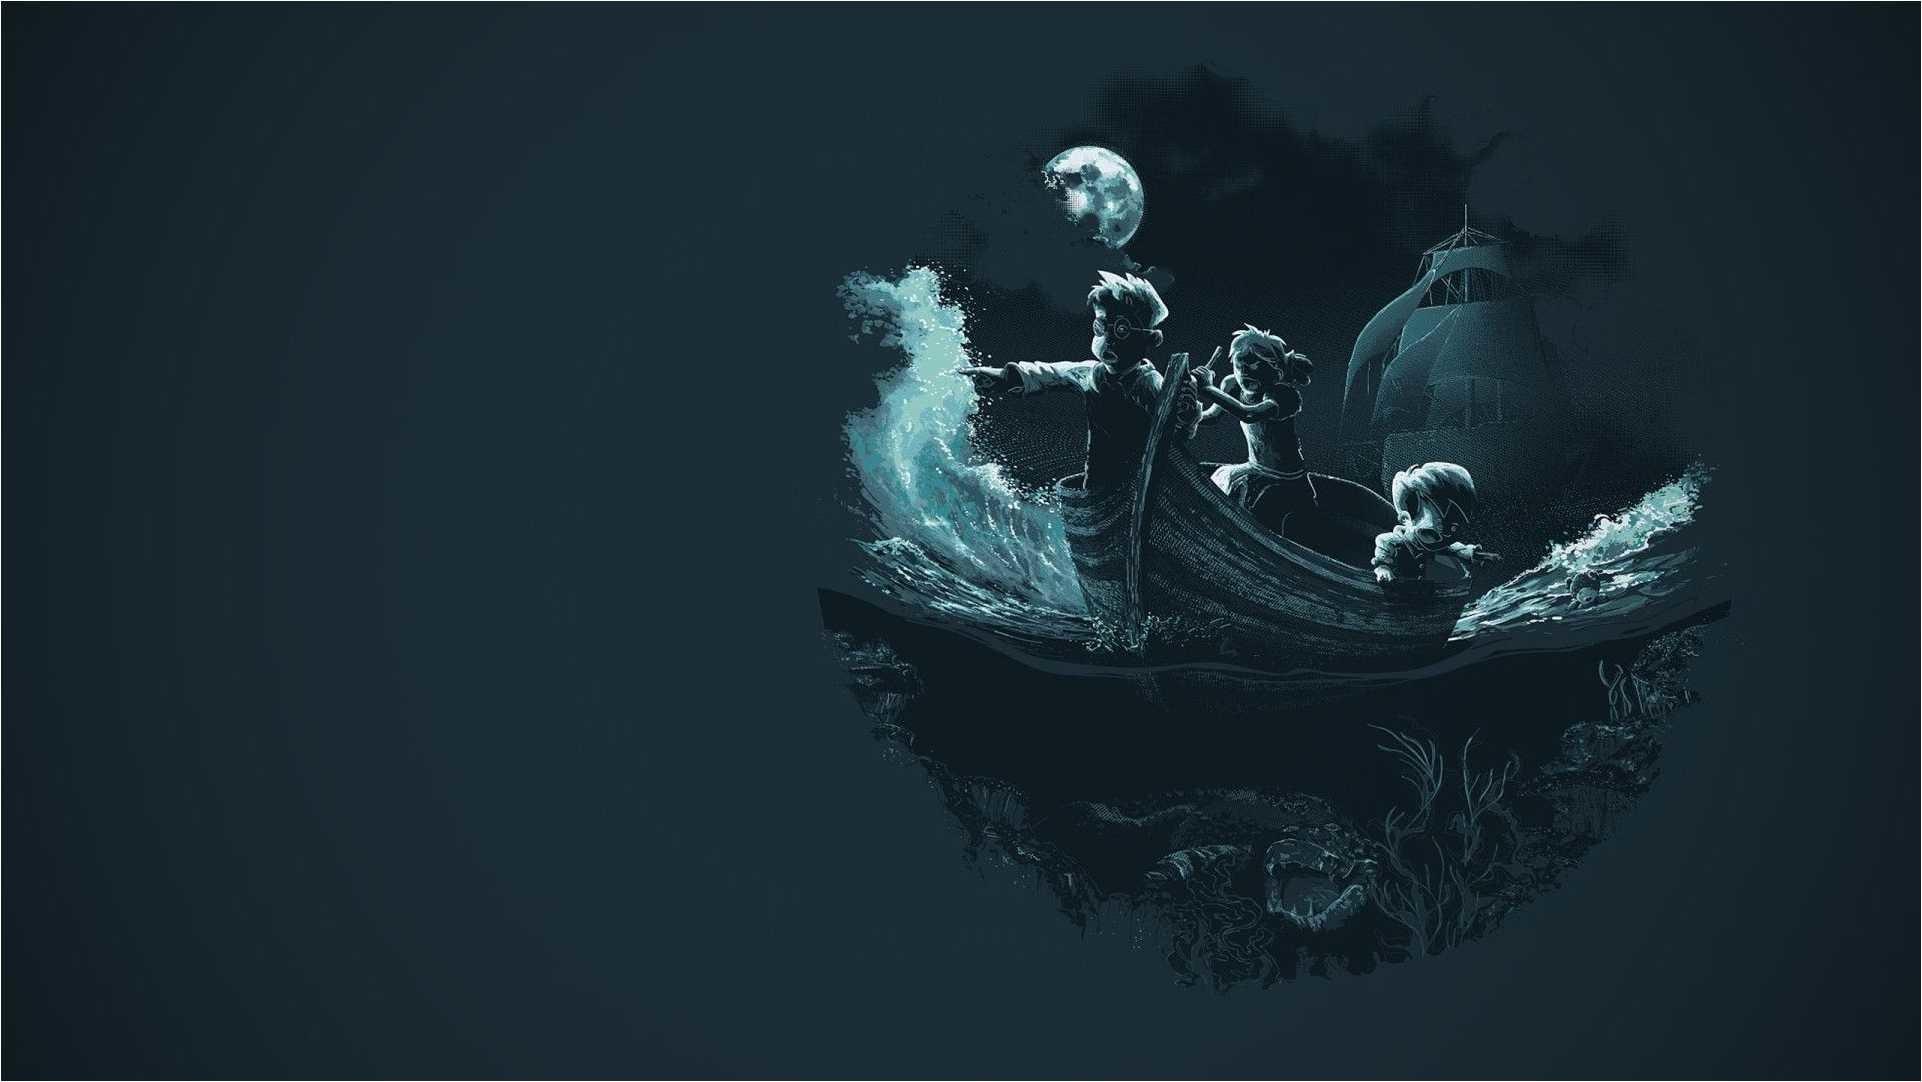 Neverland Wallpaper 61 Images